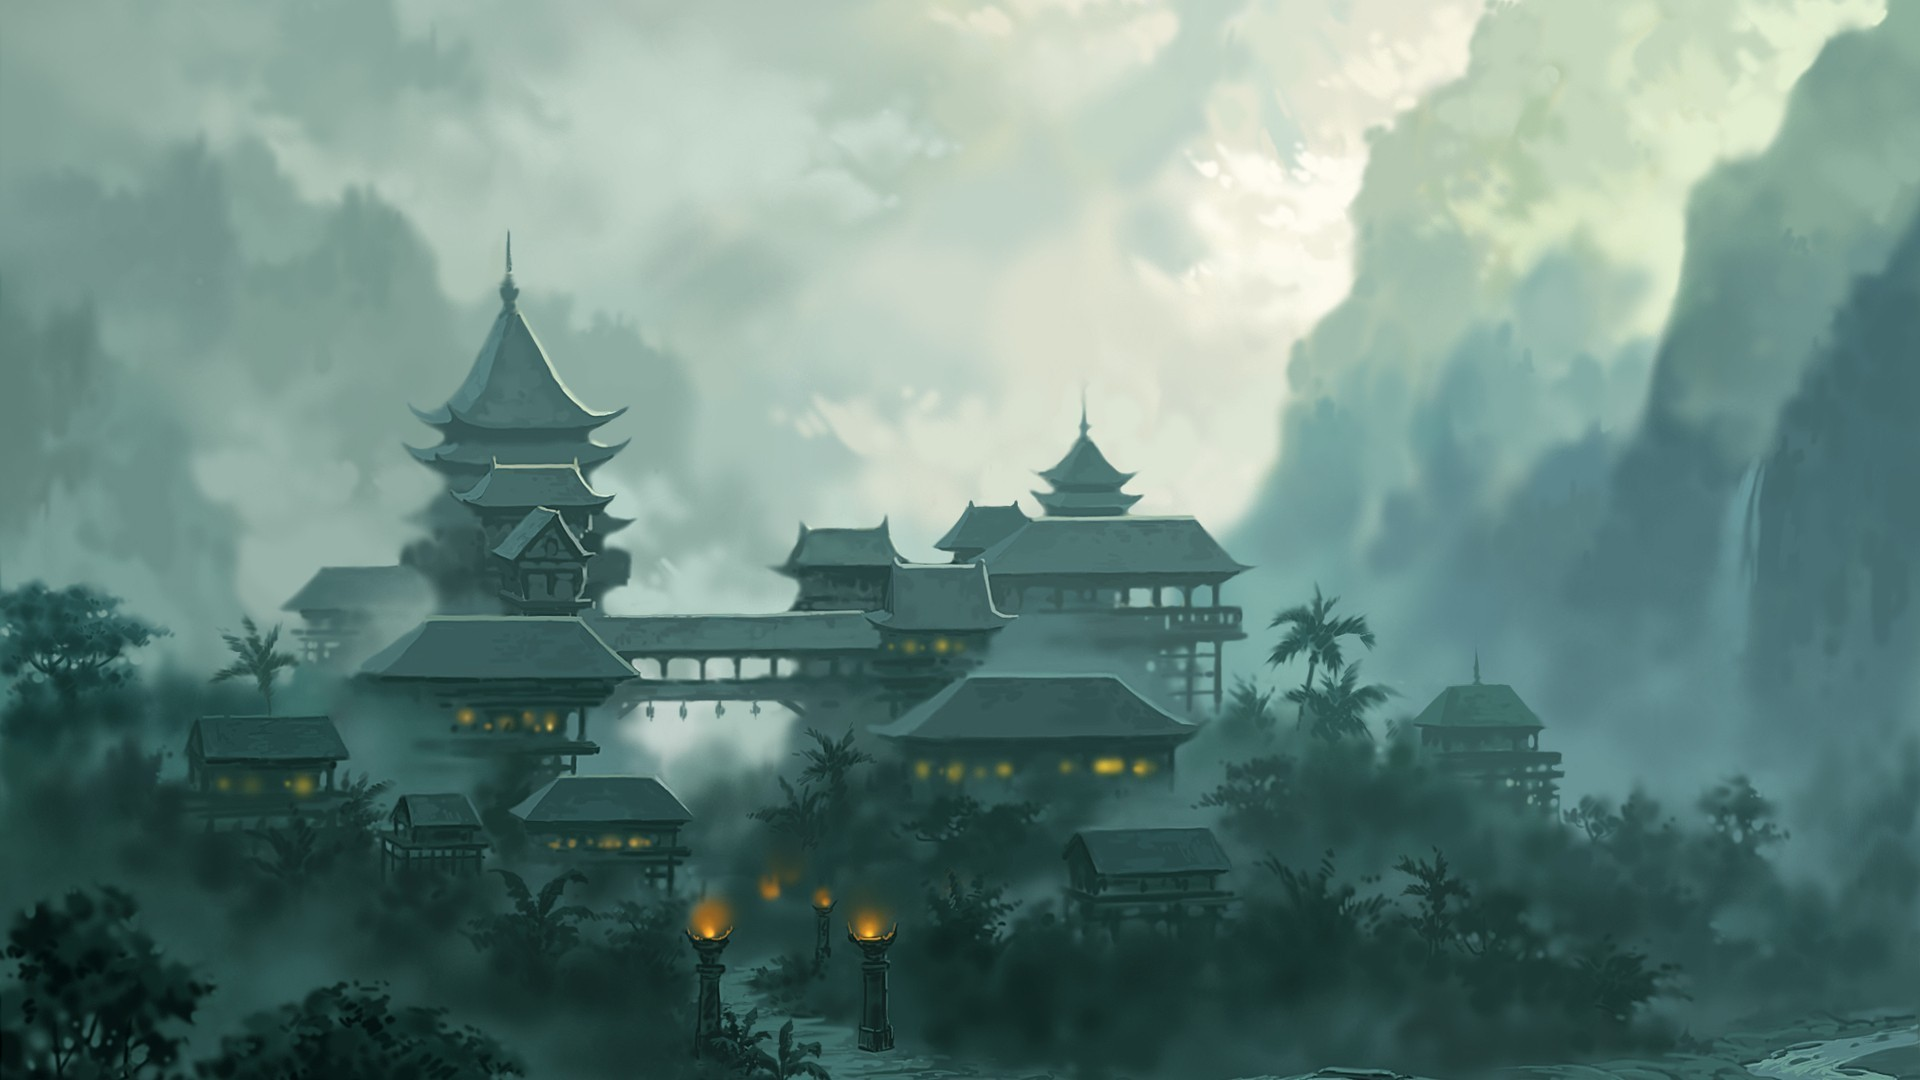 buildings landscapes mountains jungle clouds fog wallpaper background 1920x1080